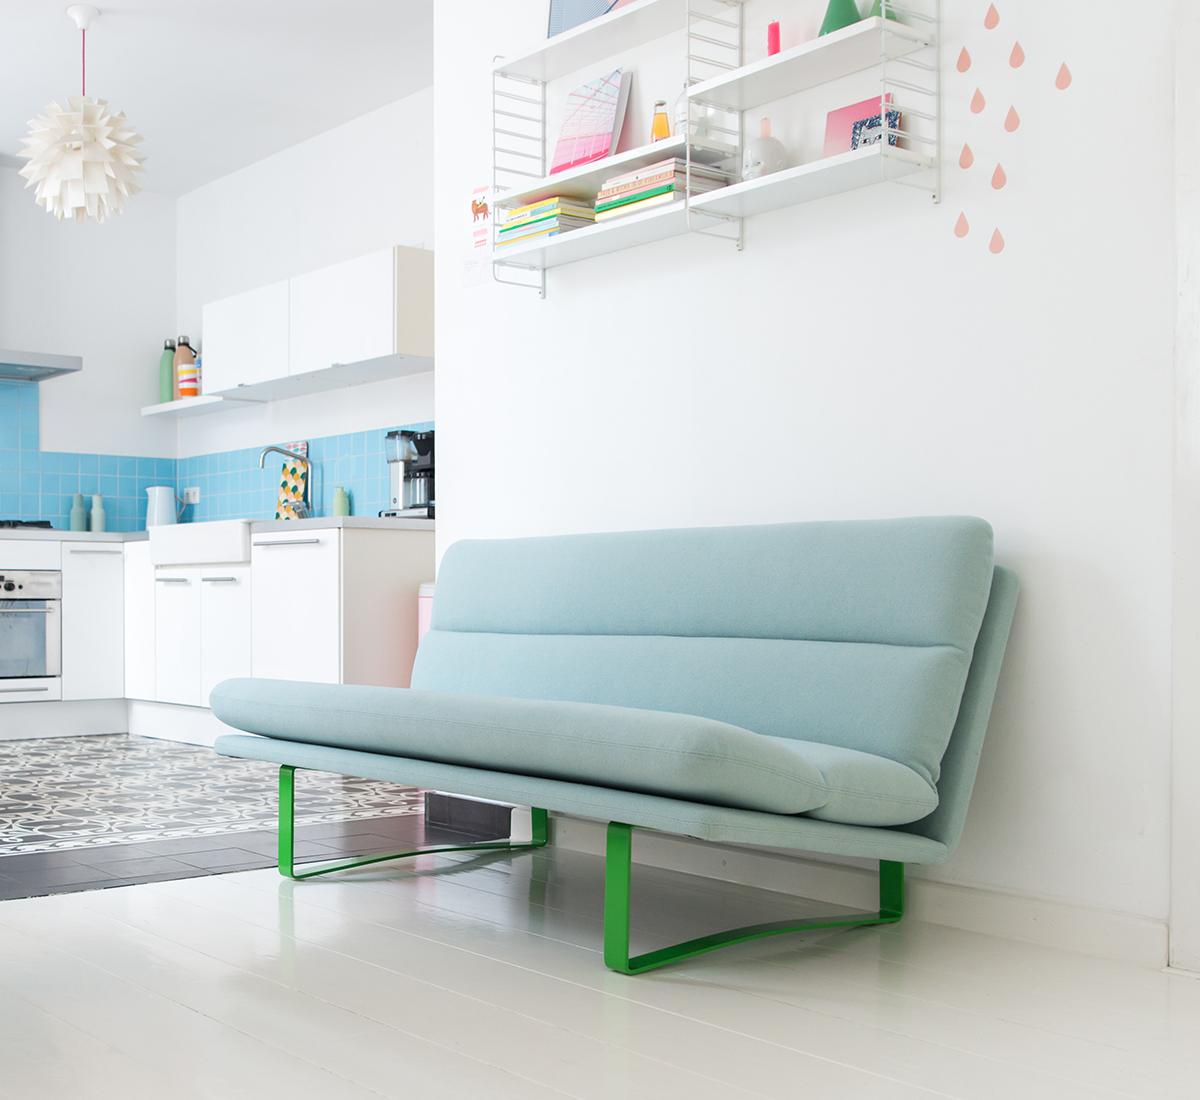 Artifort Design Bank.Artifort Sofa C683 Designer Kho Liang Ie